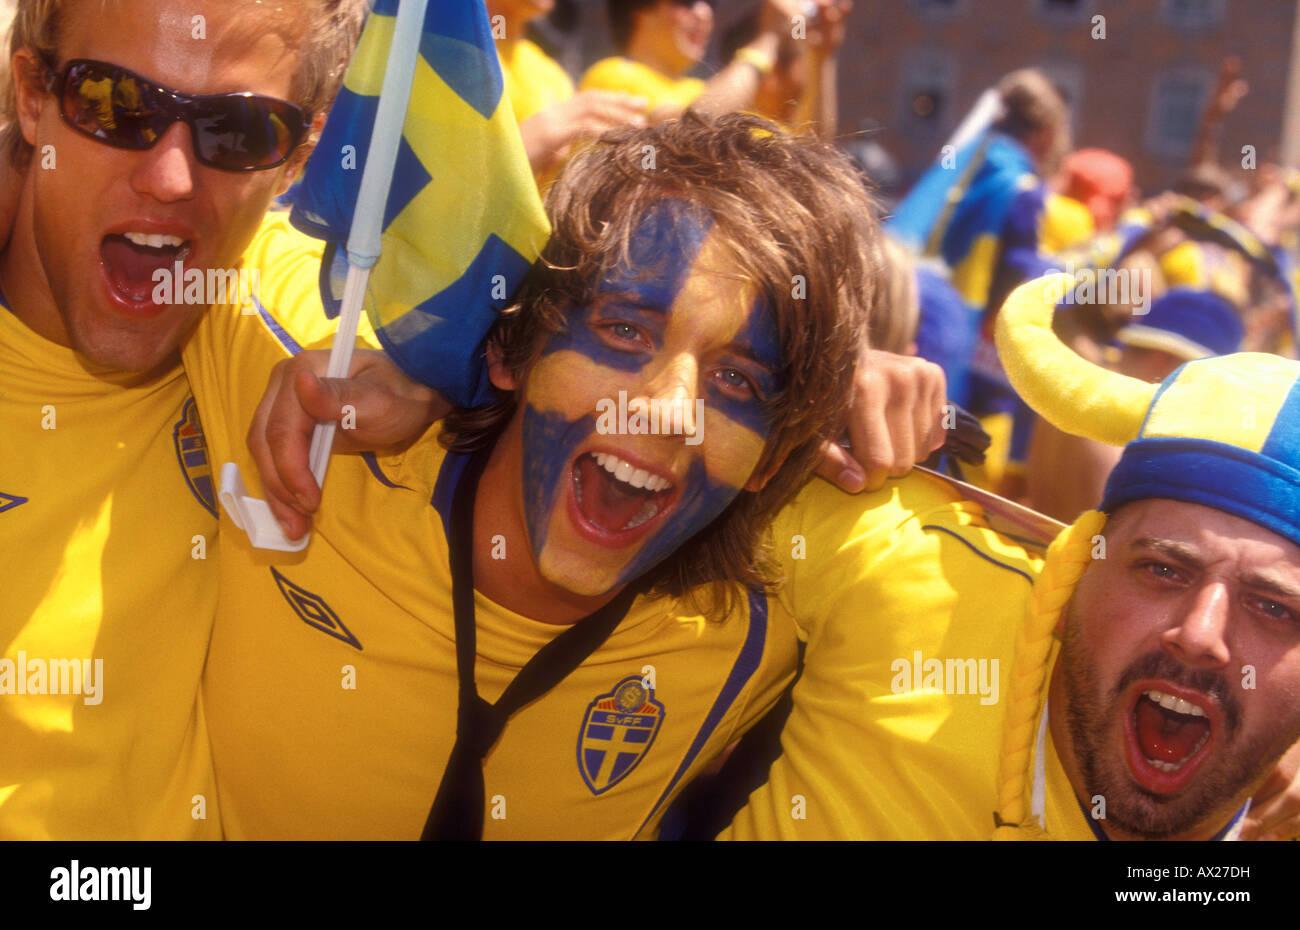 Swedish soccer fans, FIFA World Cup, Germany vs. Sweden, Munich 24.06.2006 - Stock Image